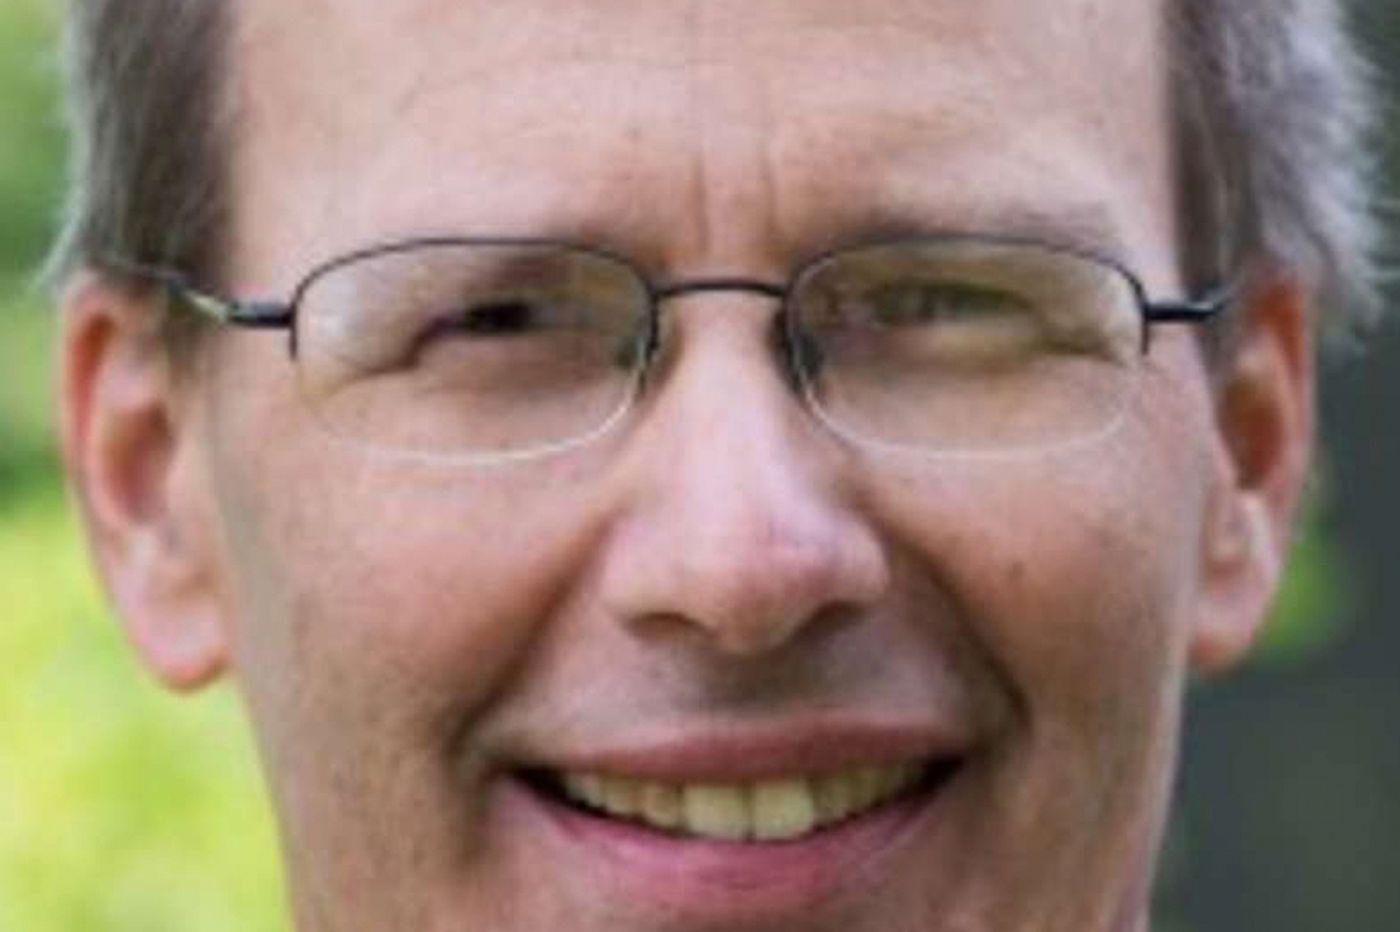 Richard Colbert, 58, head of Tyler Arboretum